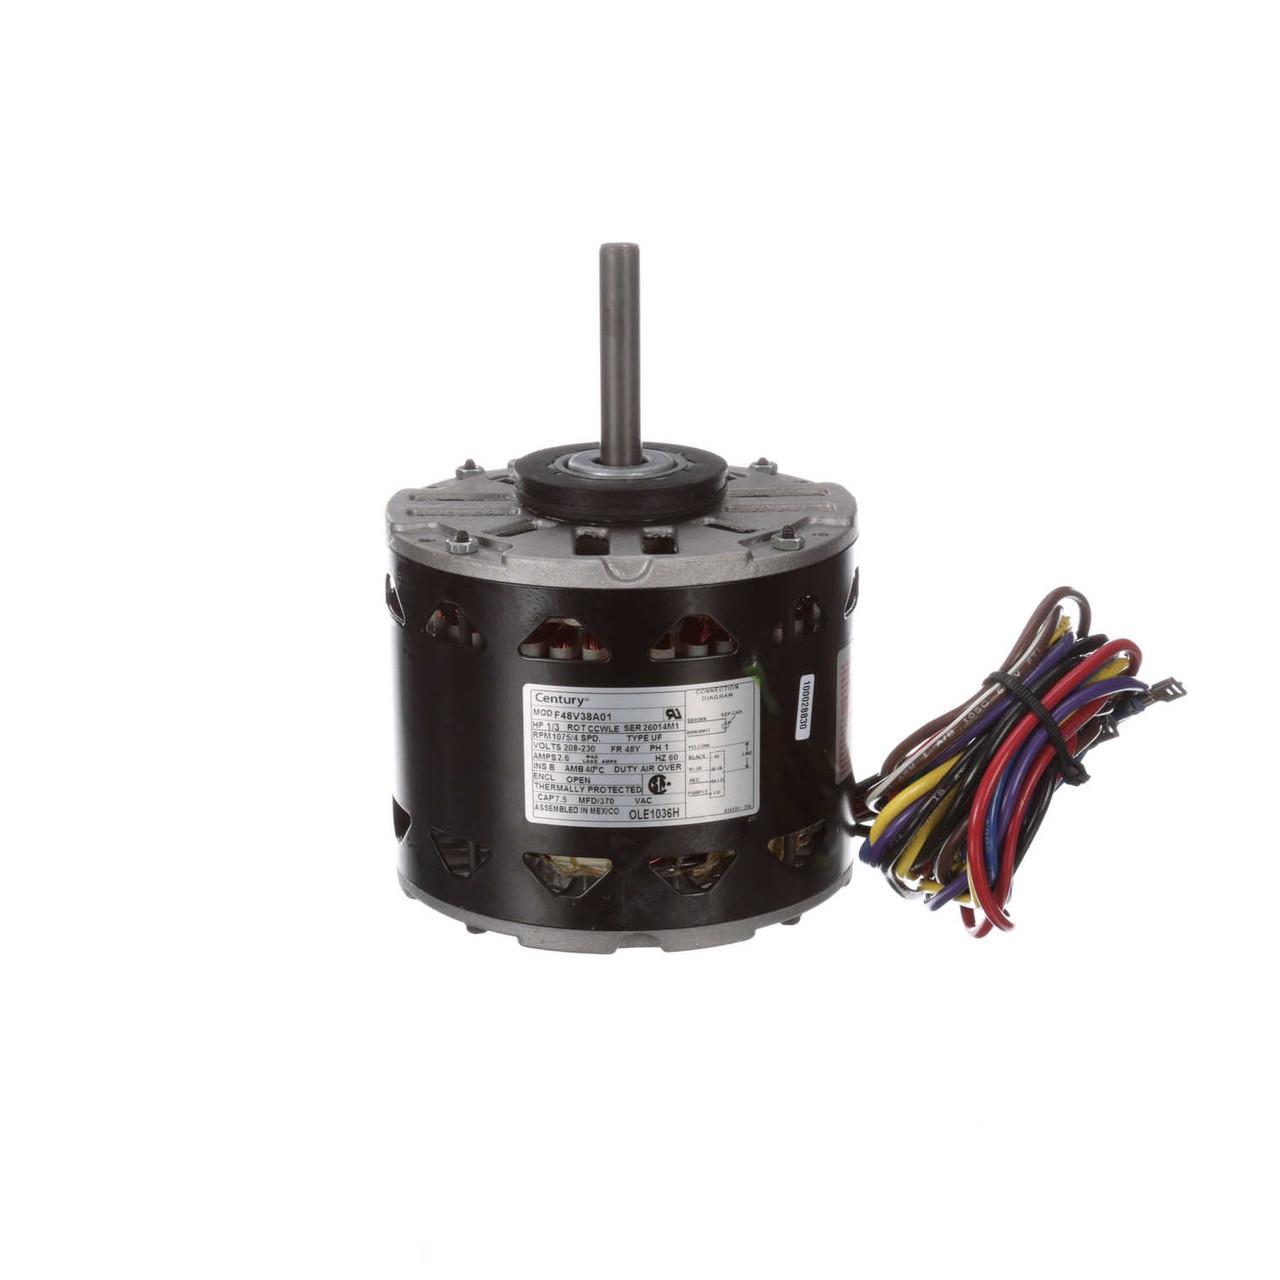 lennox furnace motor p 8 8609 1 3 hp 1075 rpm 208 230v century ole1036h [ 1280 x 1280 Pixel ]